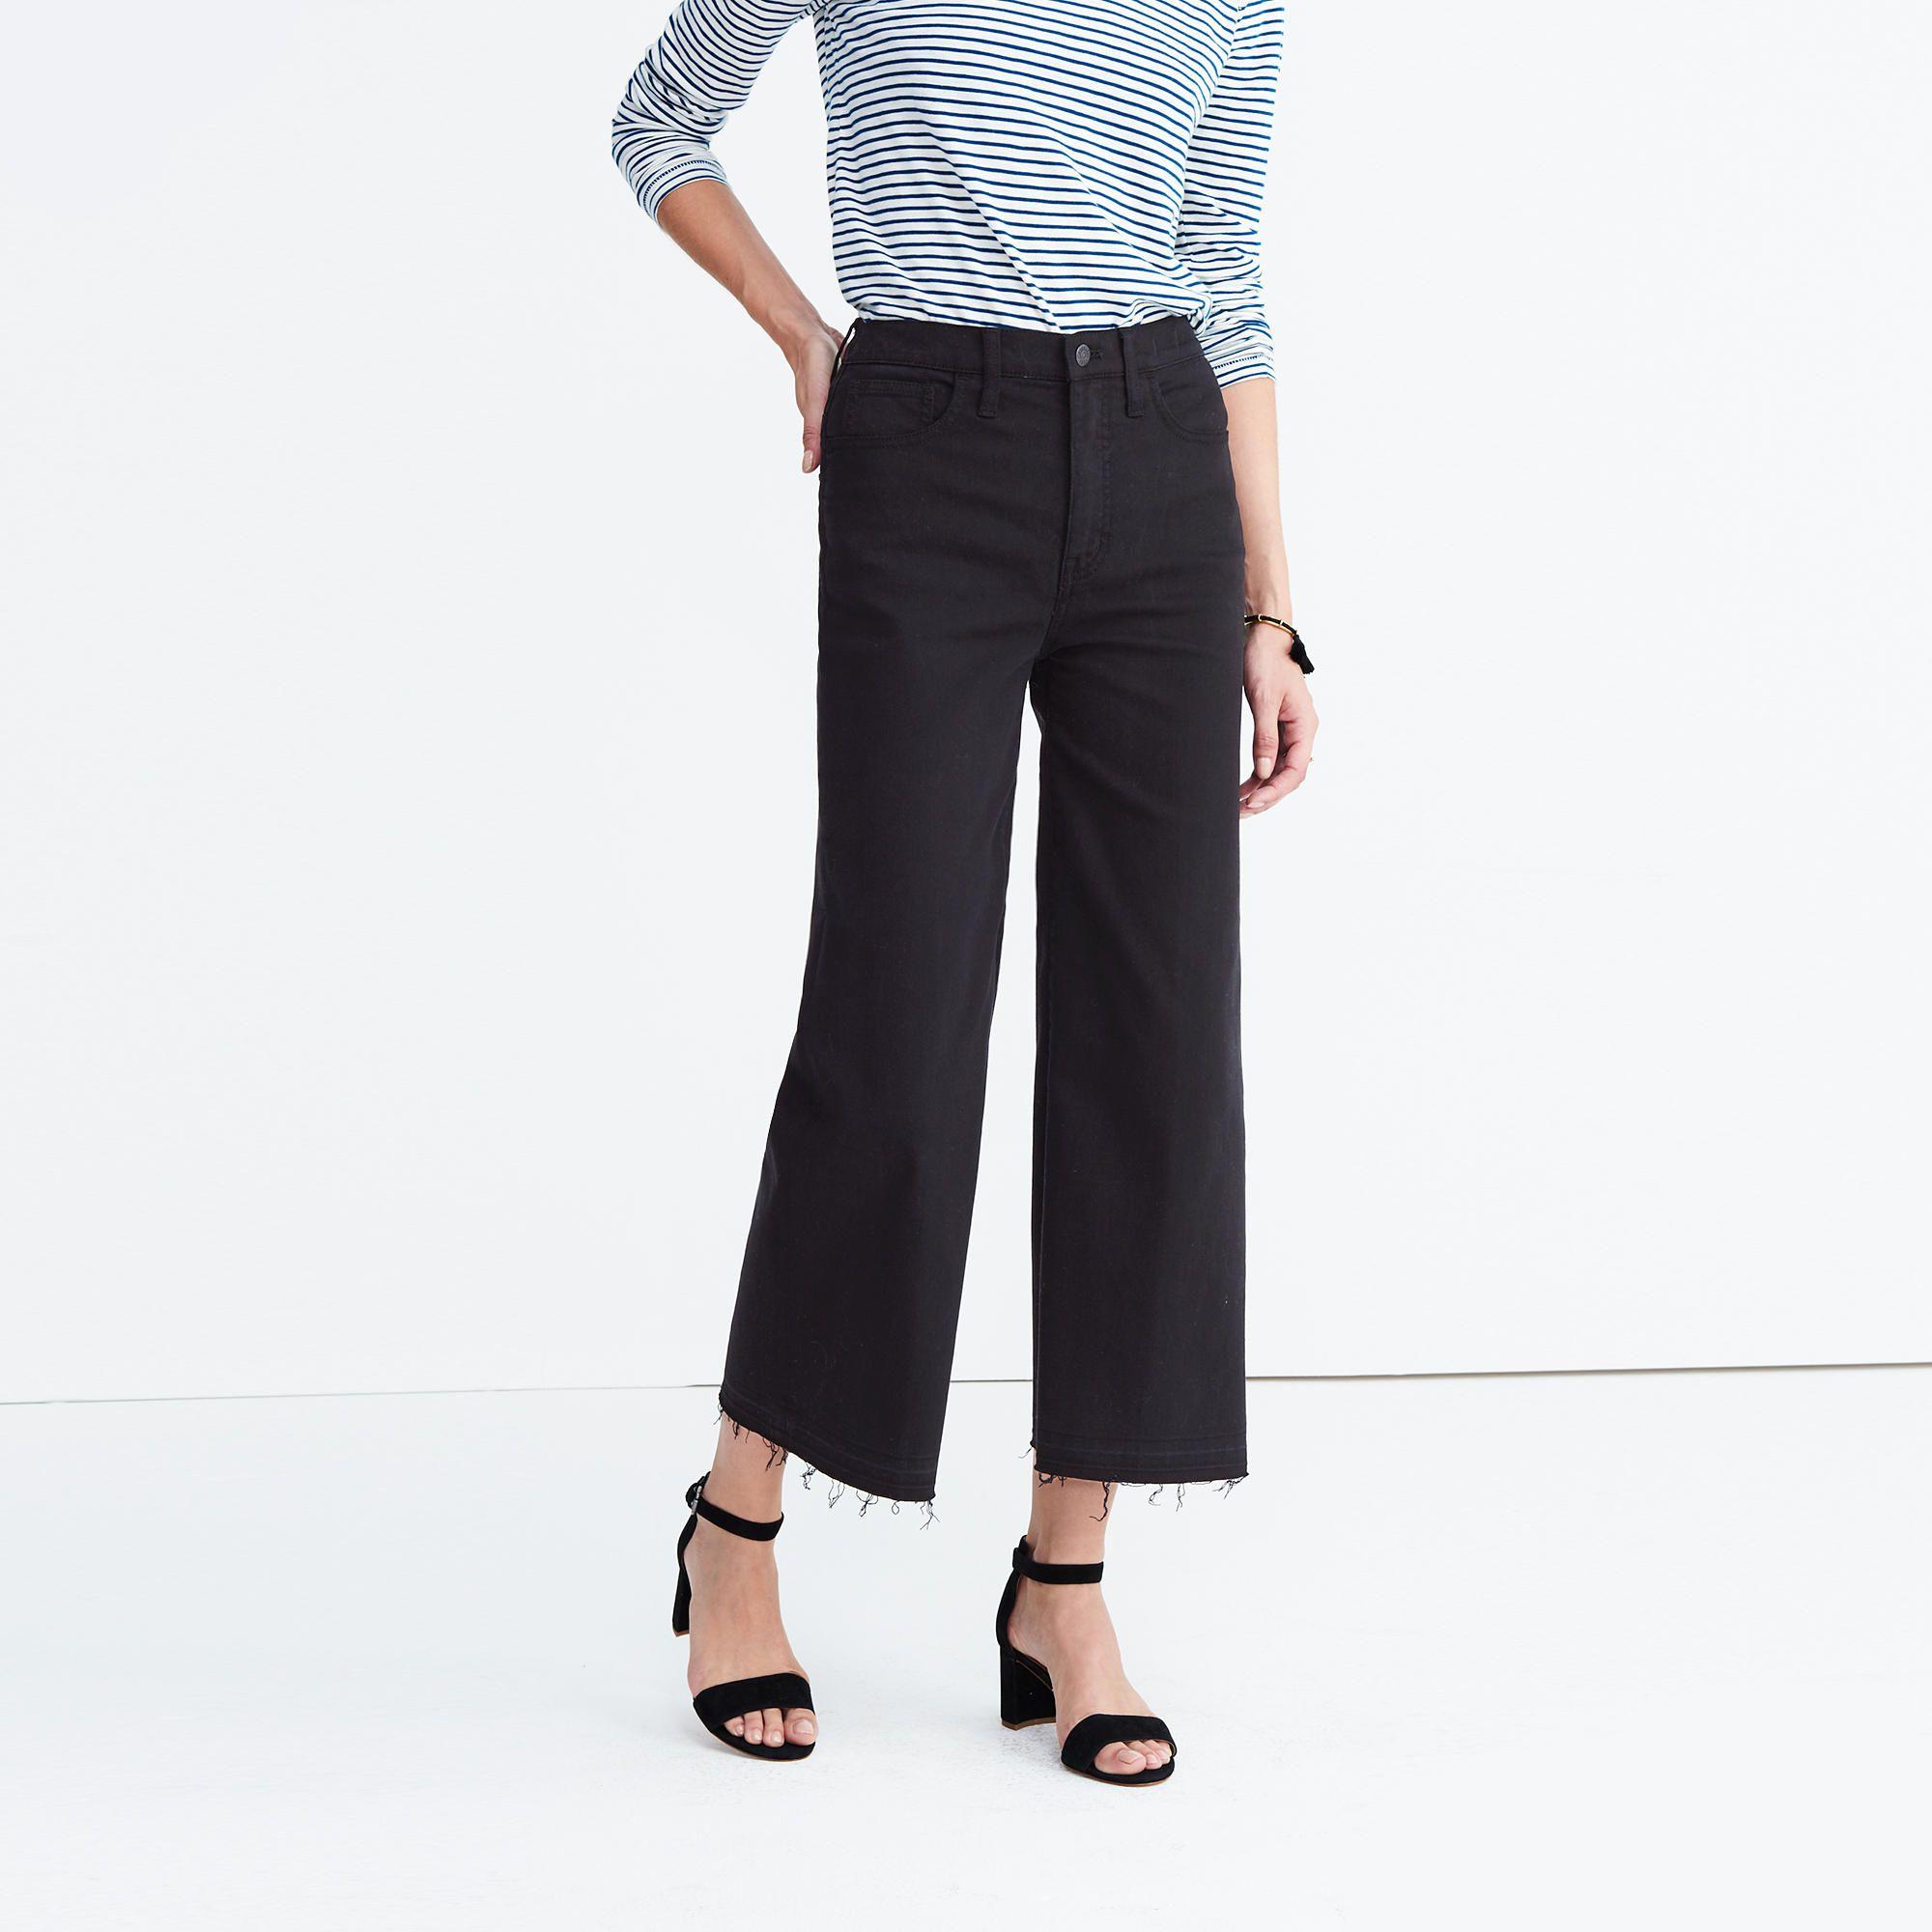 ee4c831598c4e Madewell Wide-Leg Crop Jeans in True Black  Drop-Hem Edition  60 ...